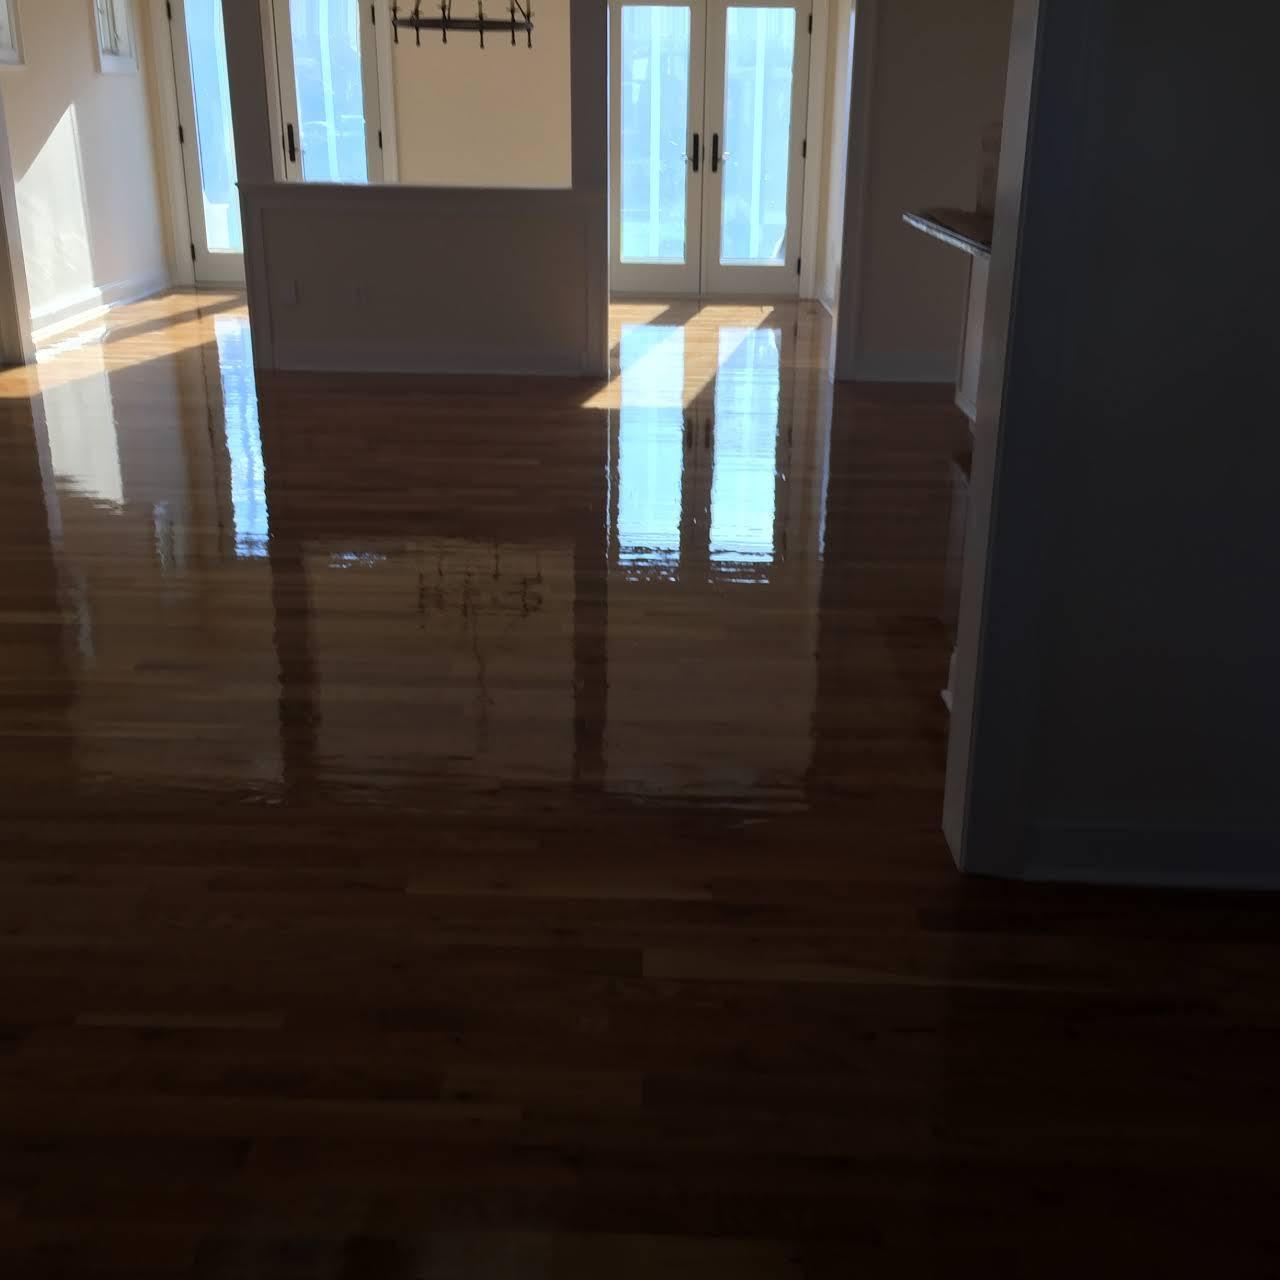 hardwood floor installation cost nj of james hardwood floorsa llc local contractor no retail price again intended for hardwood floors s